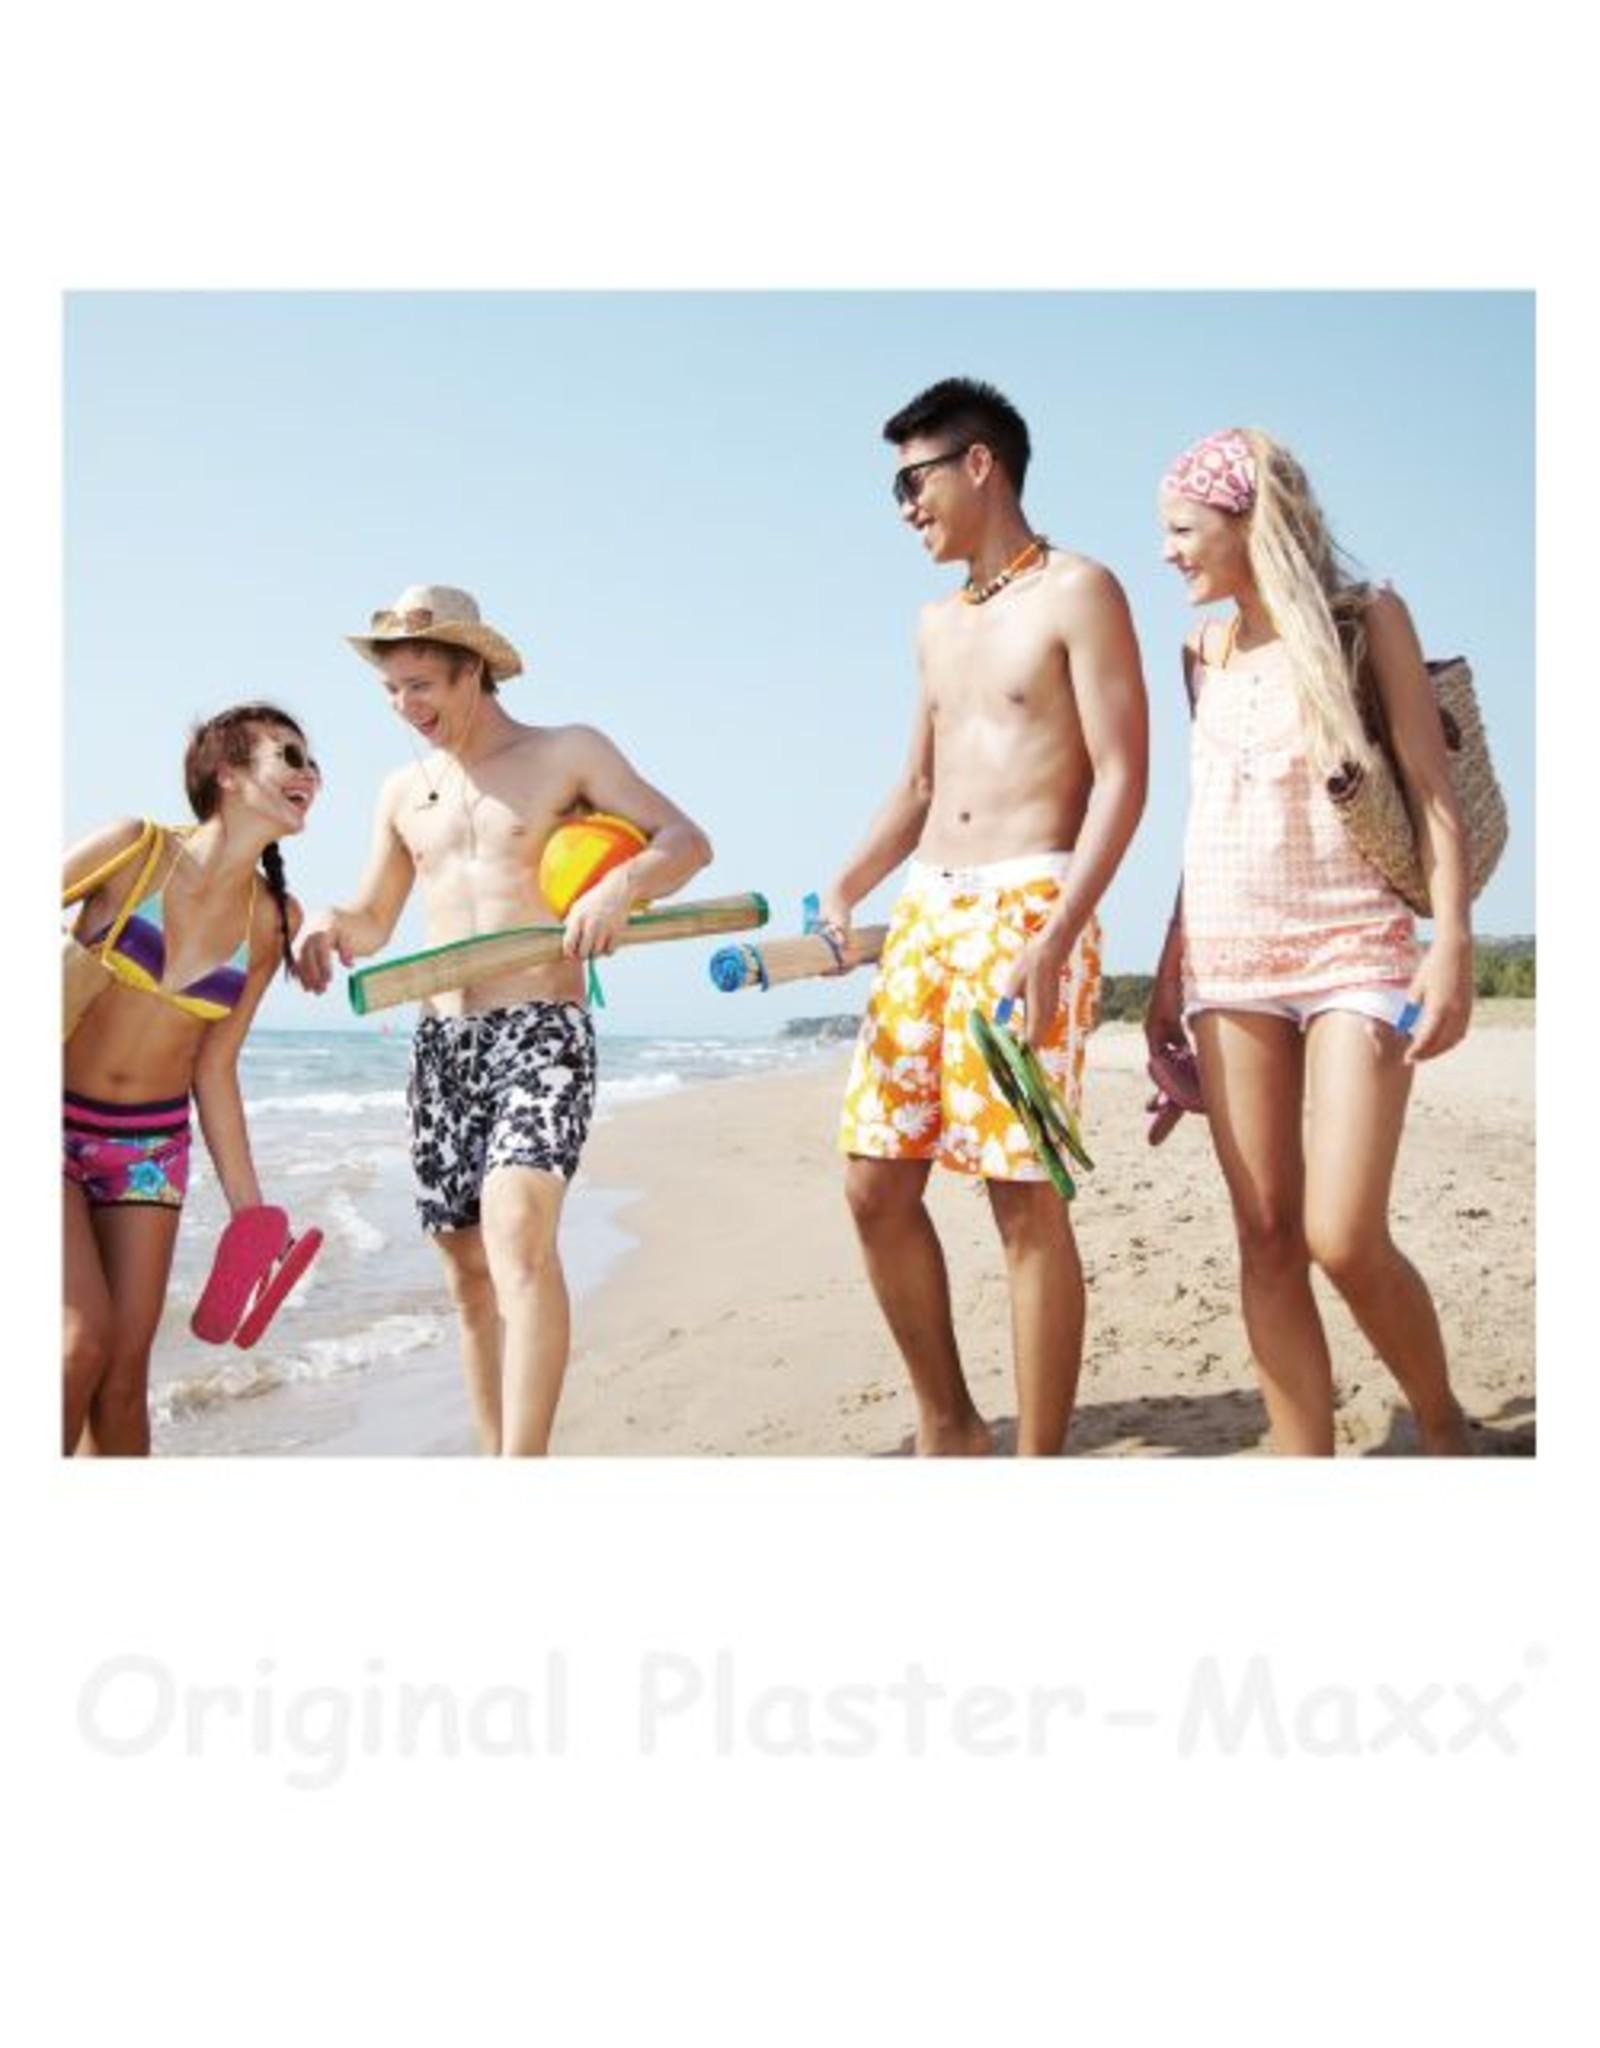 Plaster-Maxx XL Plaster-Maxx - Haut 5cm